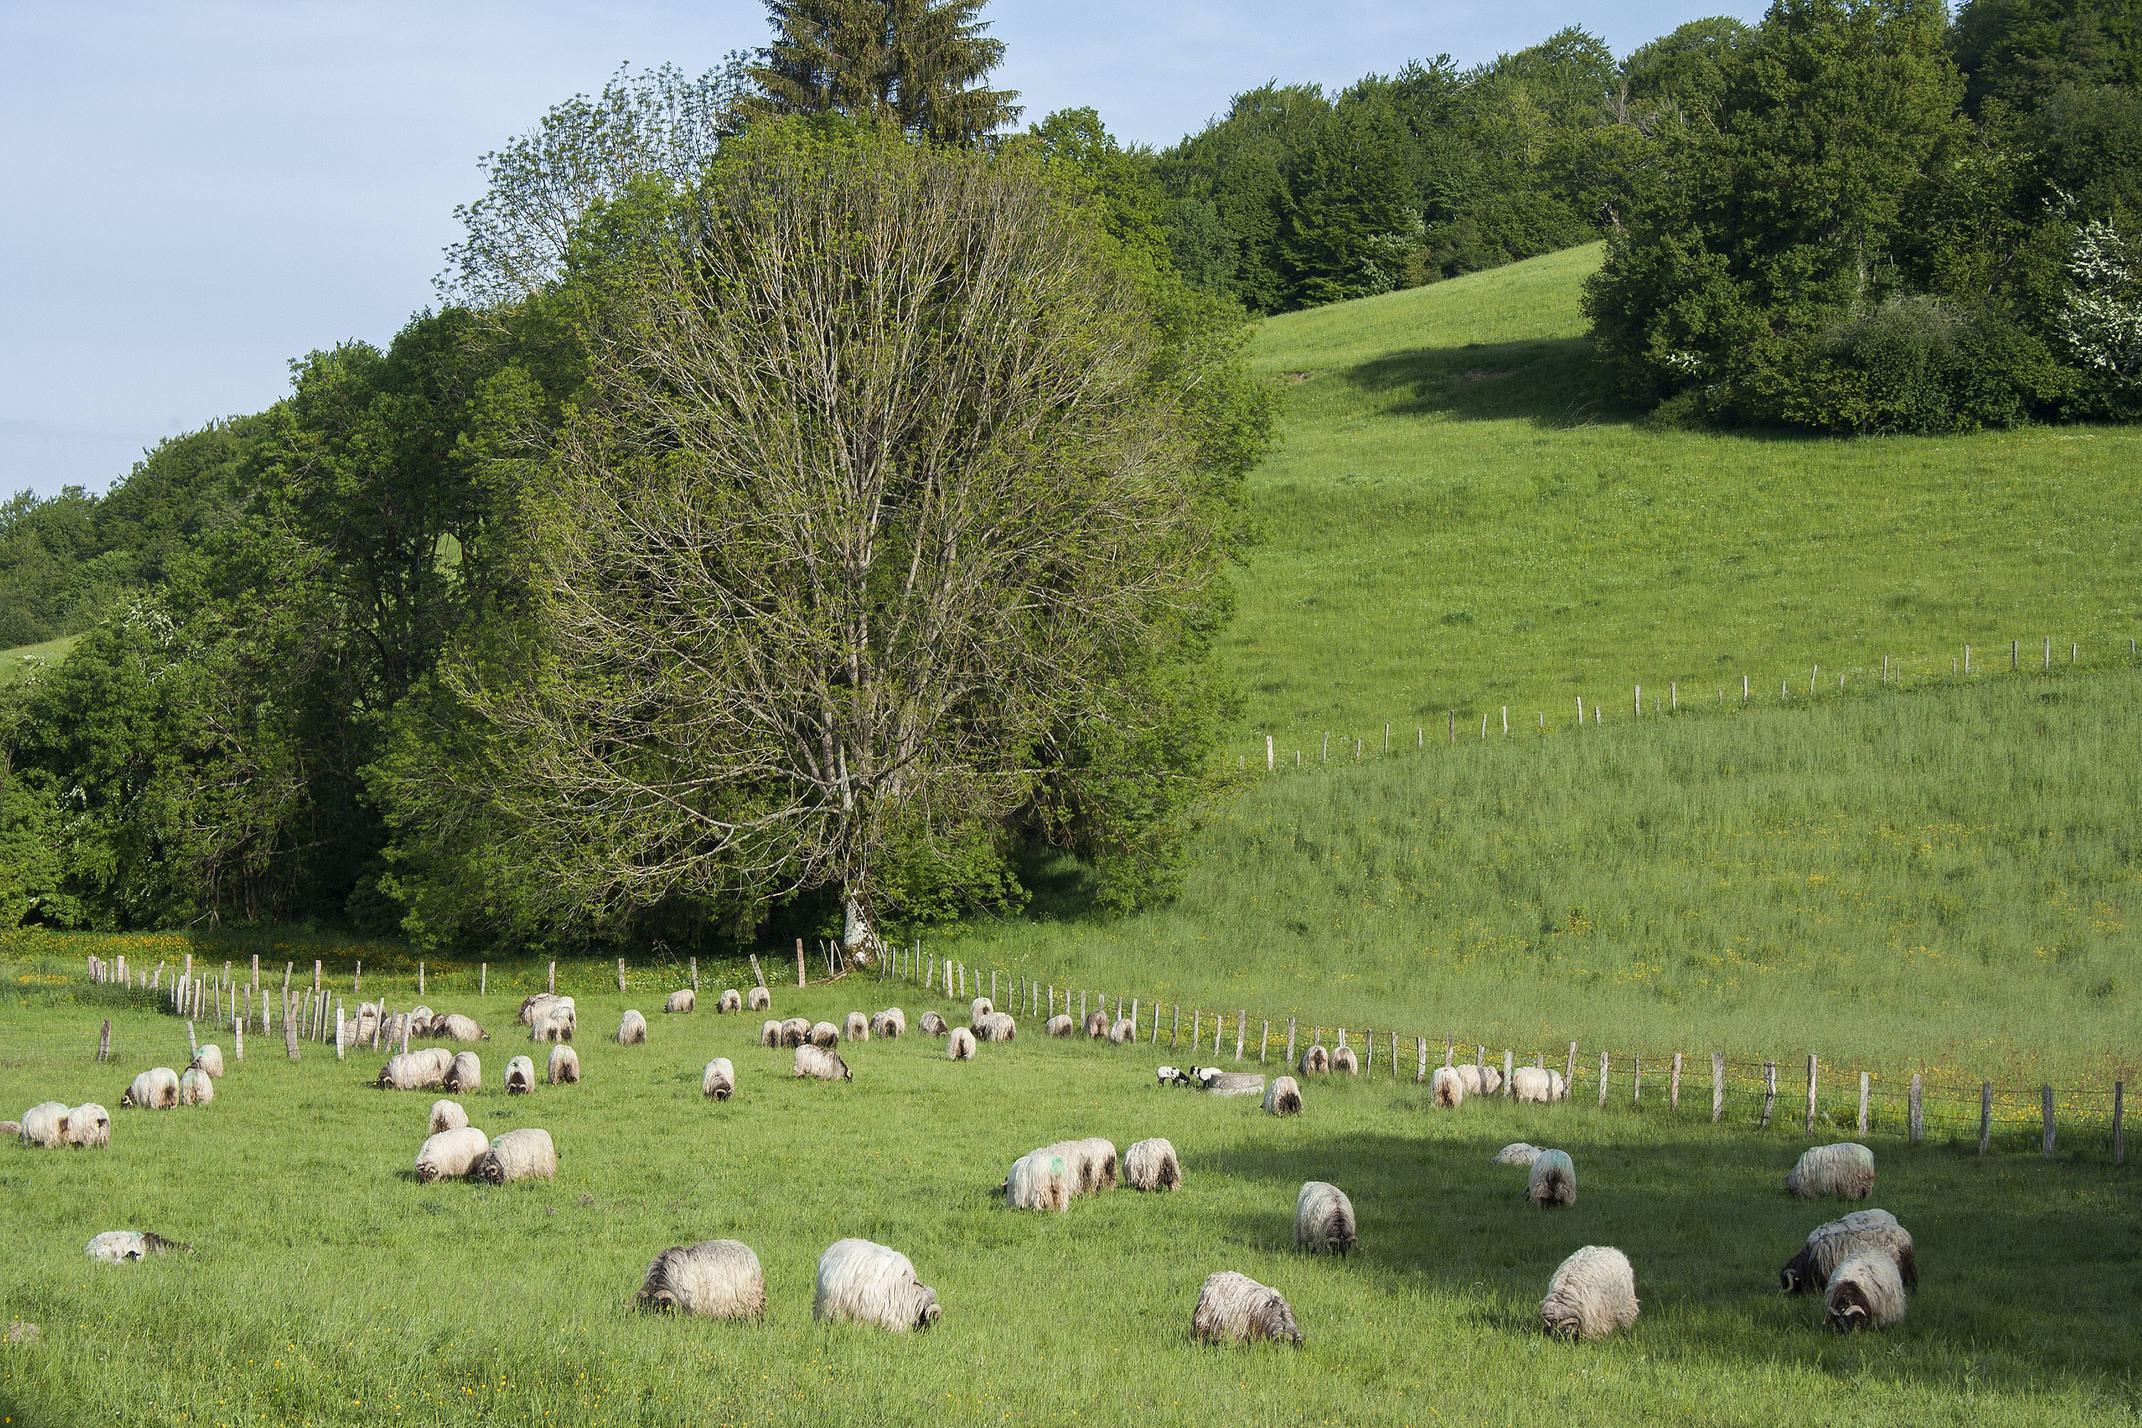 Spain navarre camino roncesvalles sheep c dmartin